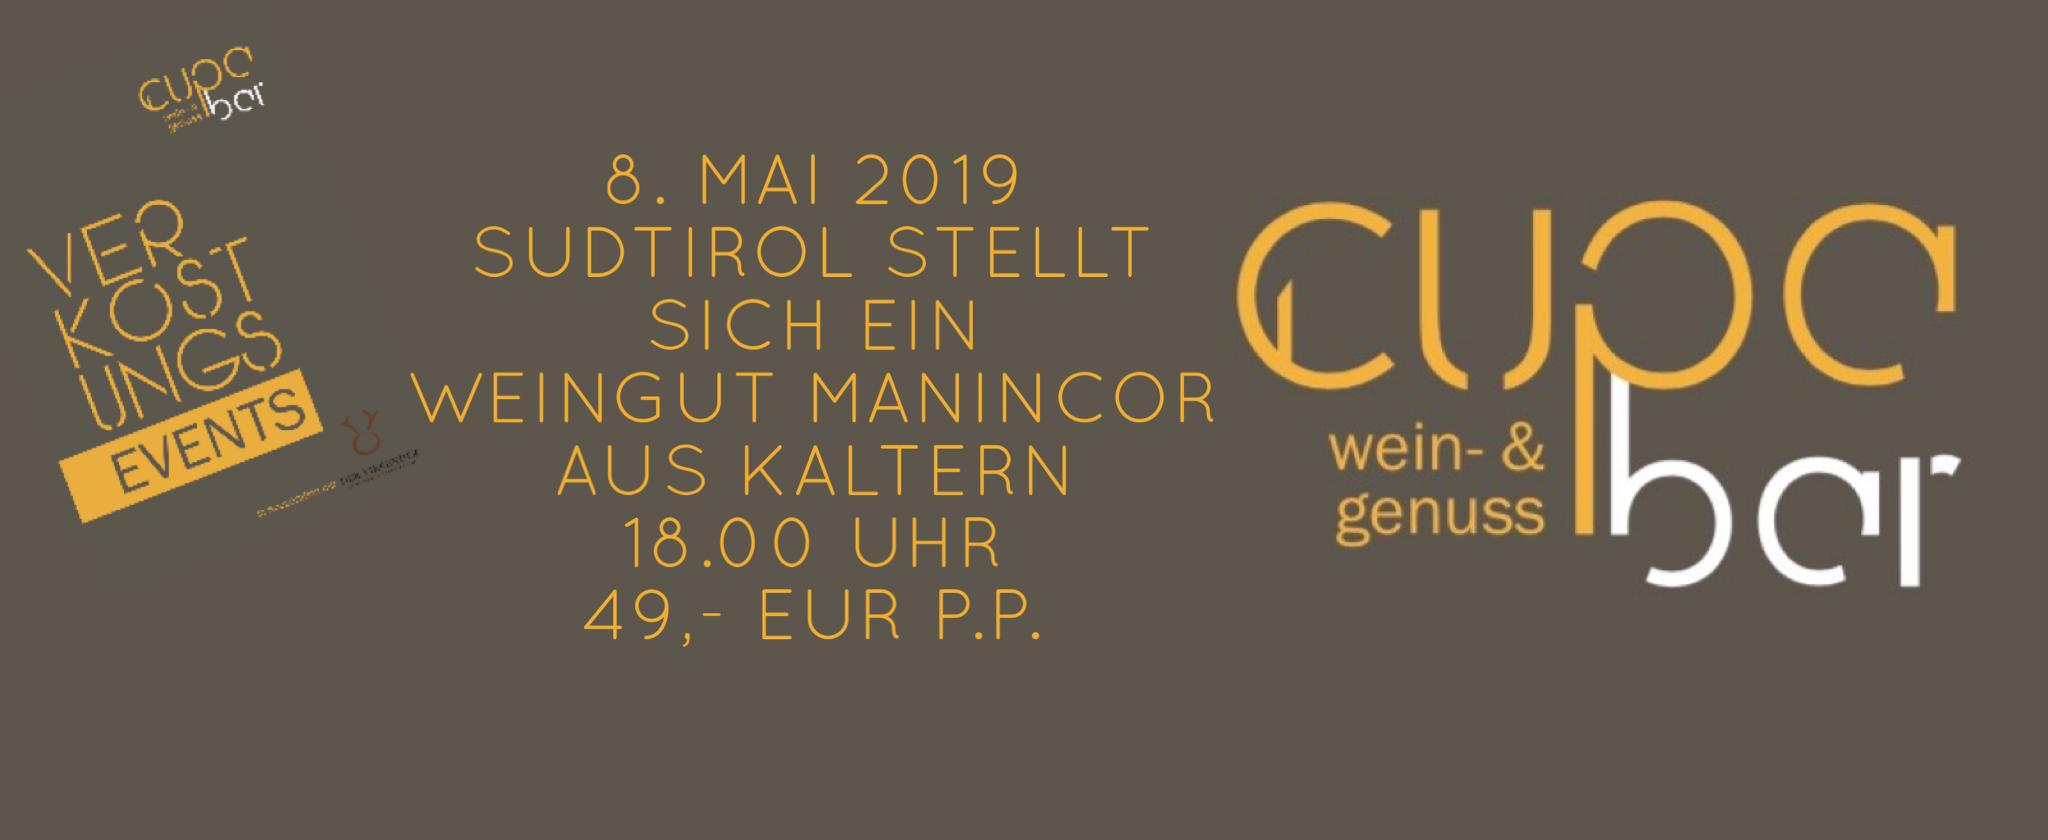 Verkostungs Events . Cupa Bar. Weingut Manincor Südtirol . 8. Mai 2019